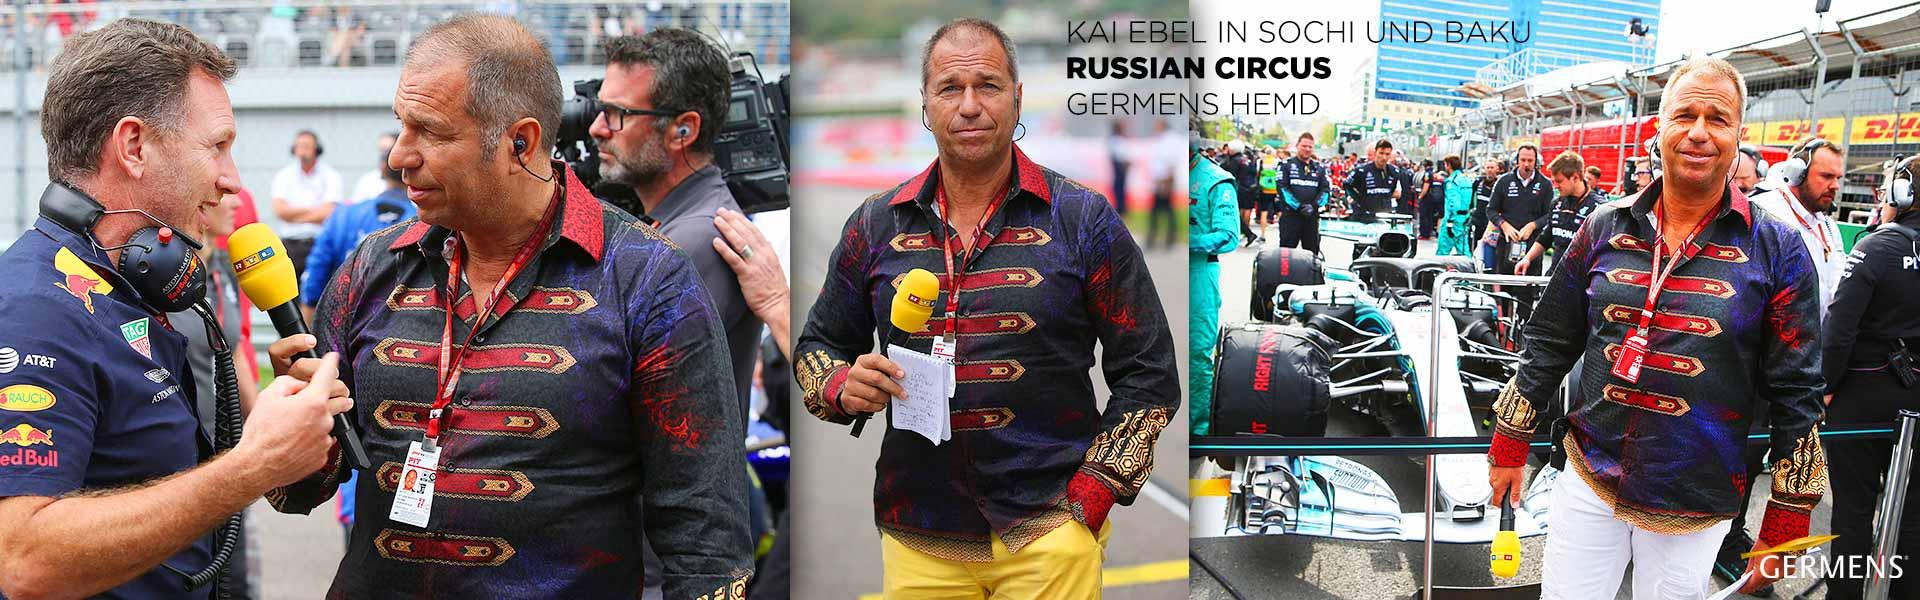 GERMENS Hemd RUSSIAN CIRCUS